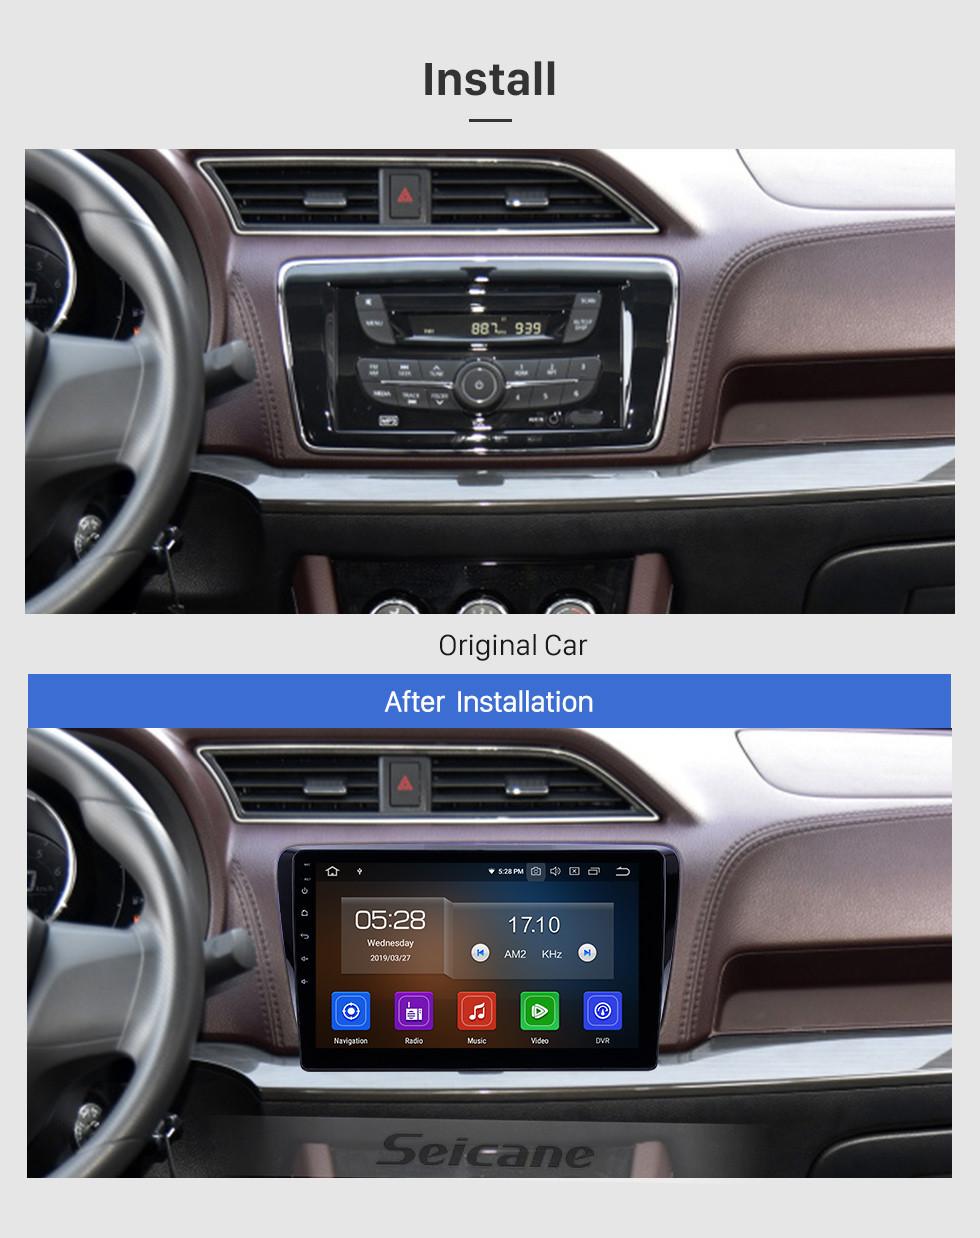 Seicane 10,1 zoll 2017-2019 Venucia M50V Android 9,0 GPS Navigationsradio Bluetooth HD Touchscreen Carplay unterstützung Spiegel Link